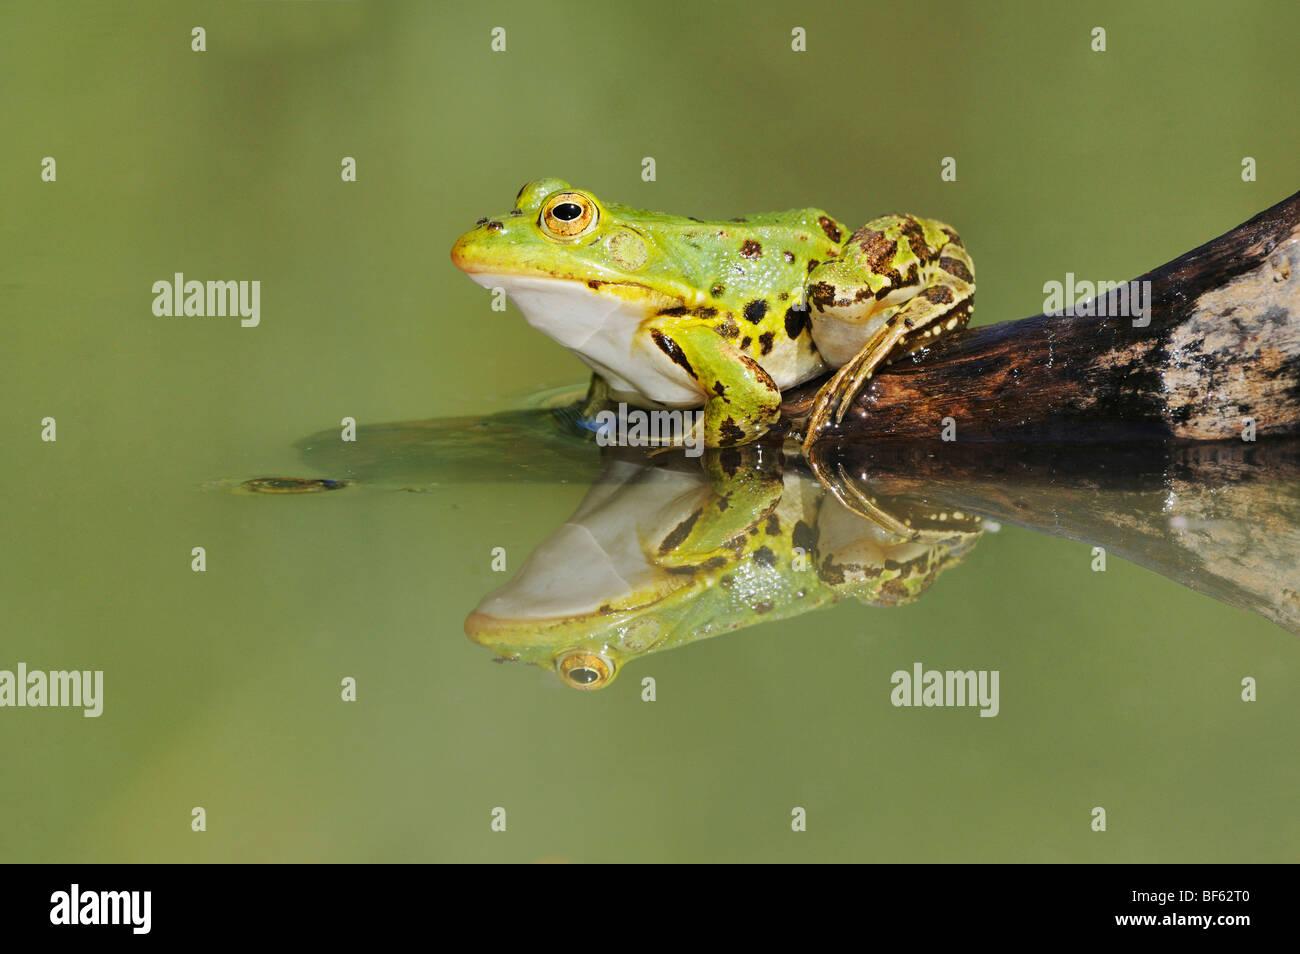 Edible Frog (Rana esculenta), adult on log, Switzerland, Europe - Stock Image